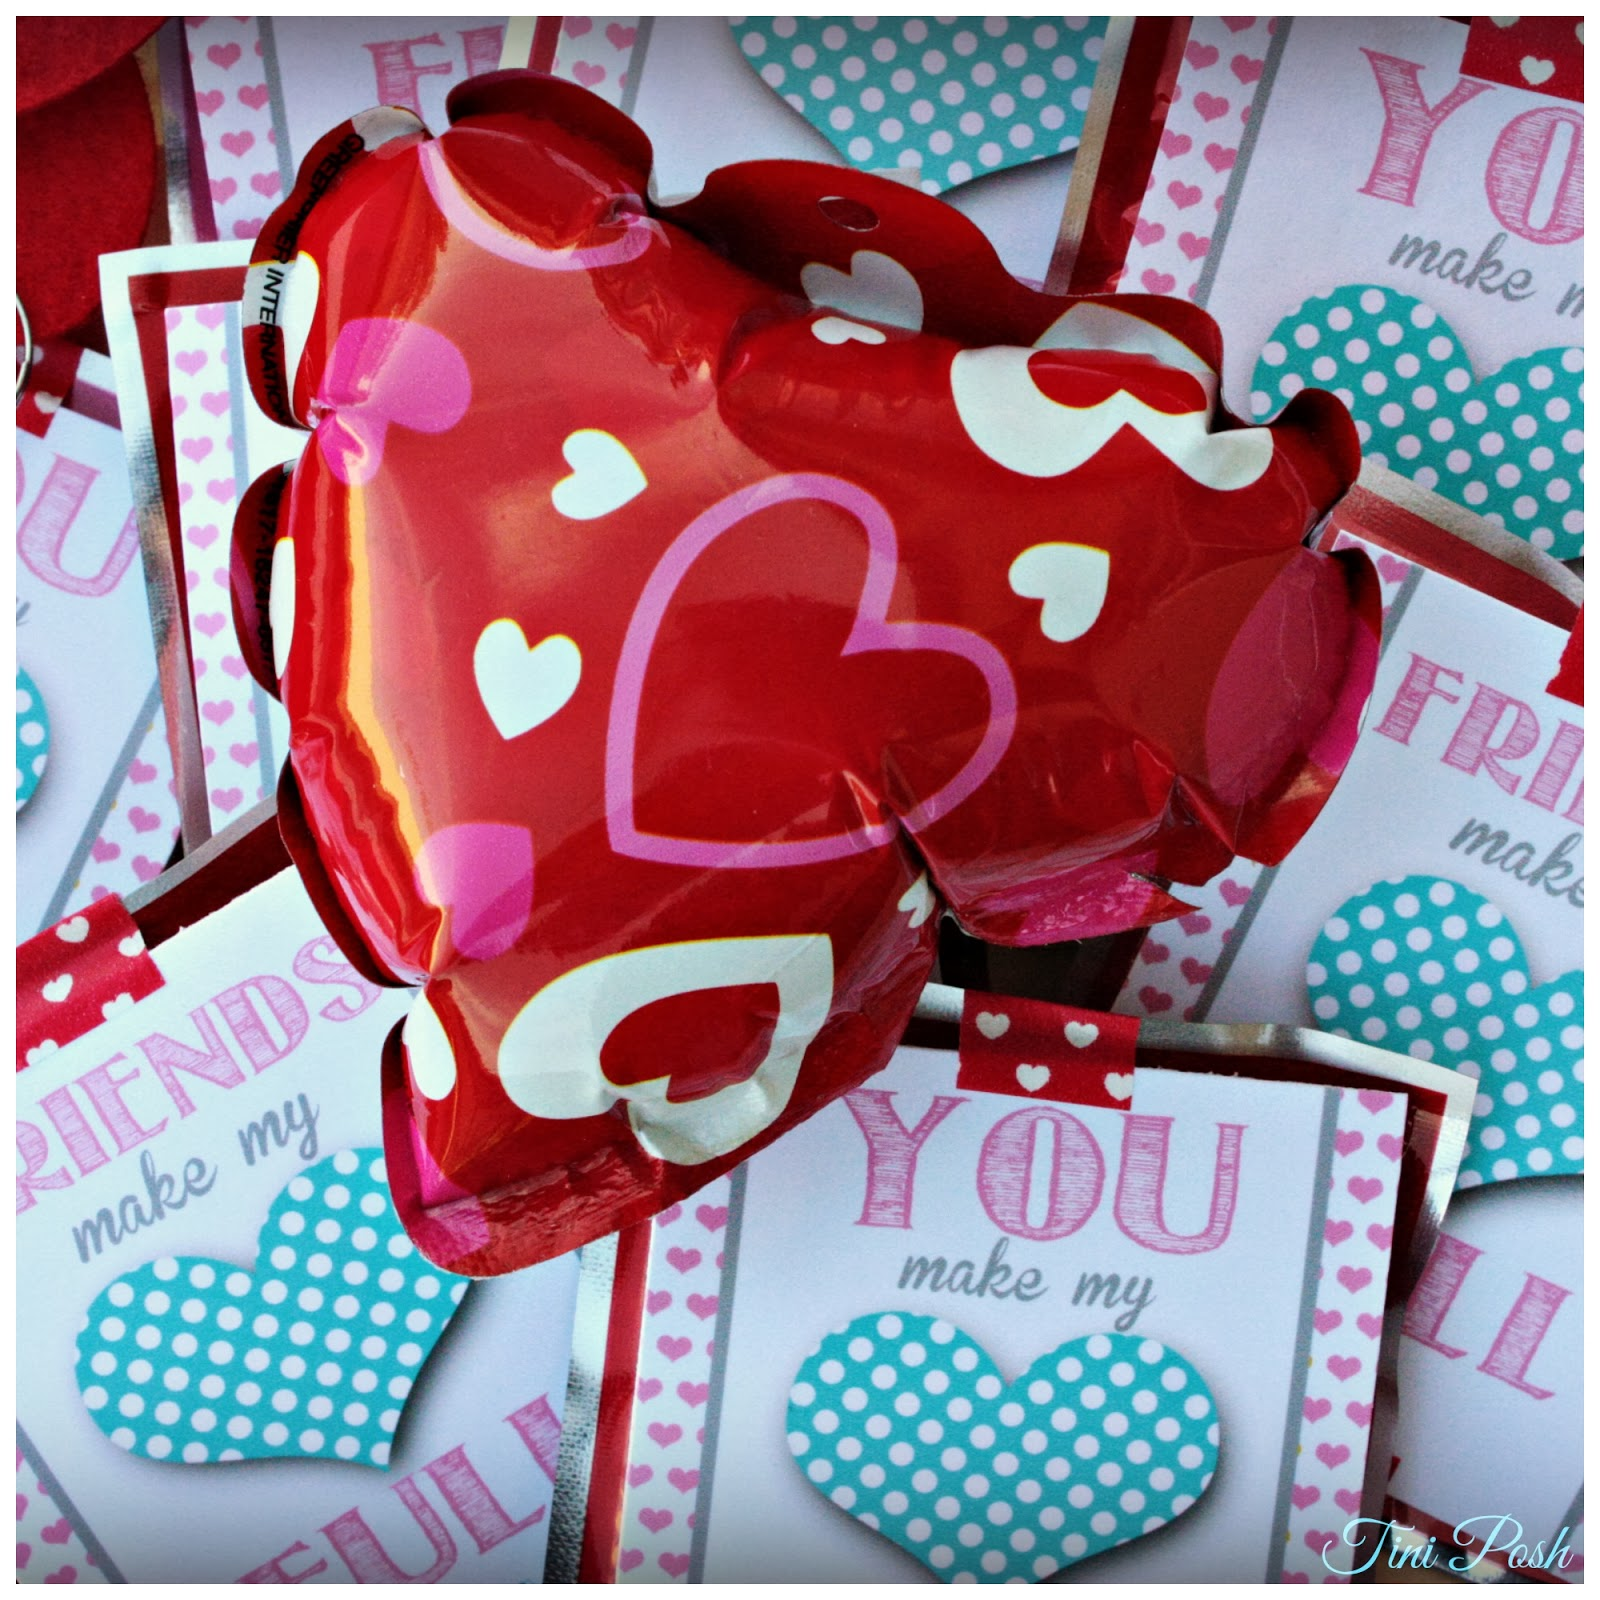 Tini Posh You Make My Heart FULL Free Valentines Day